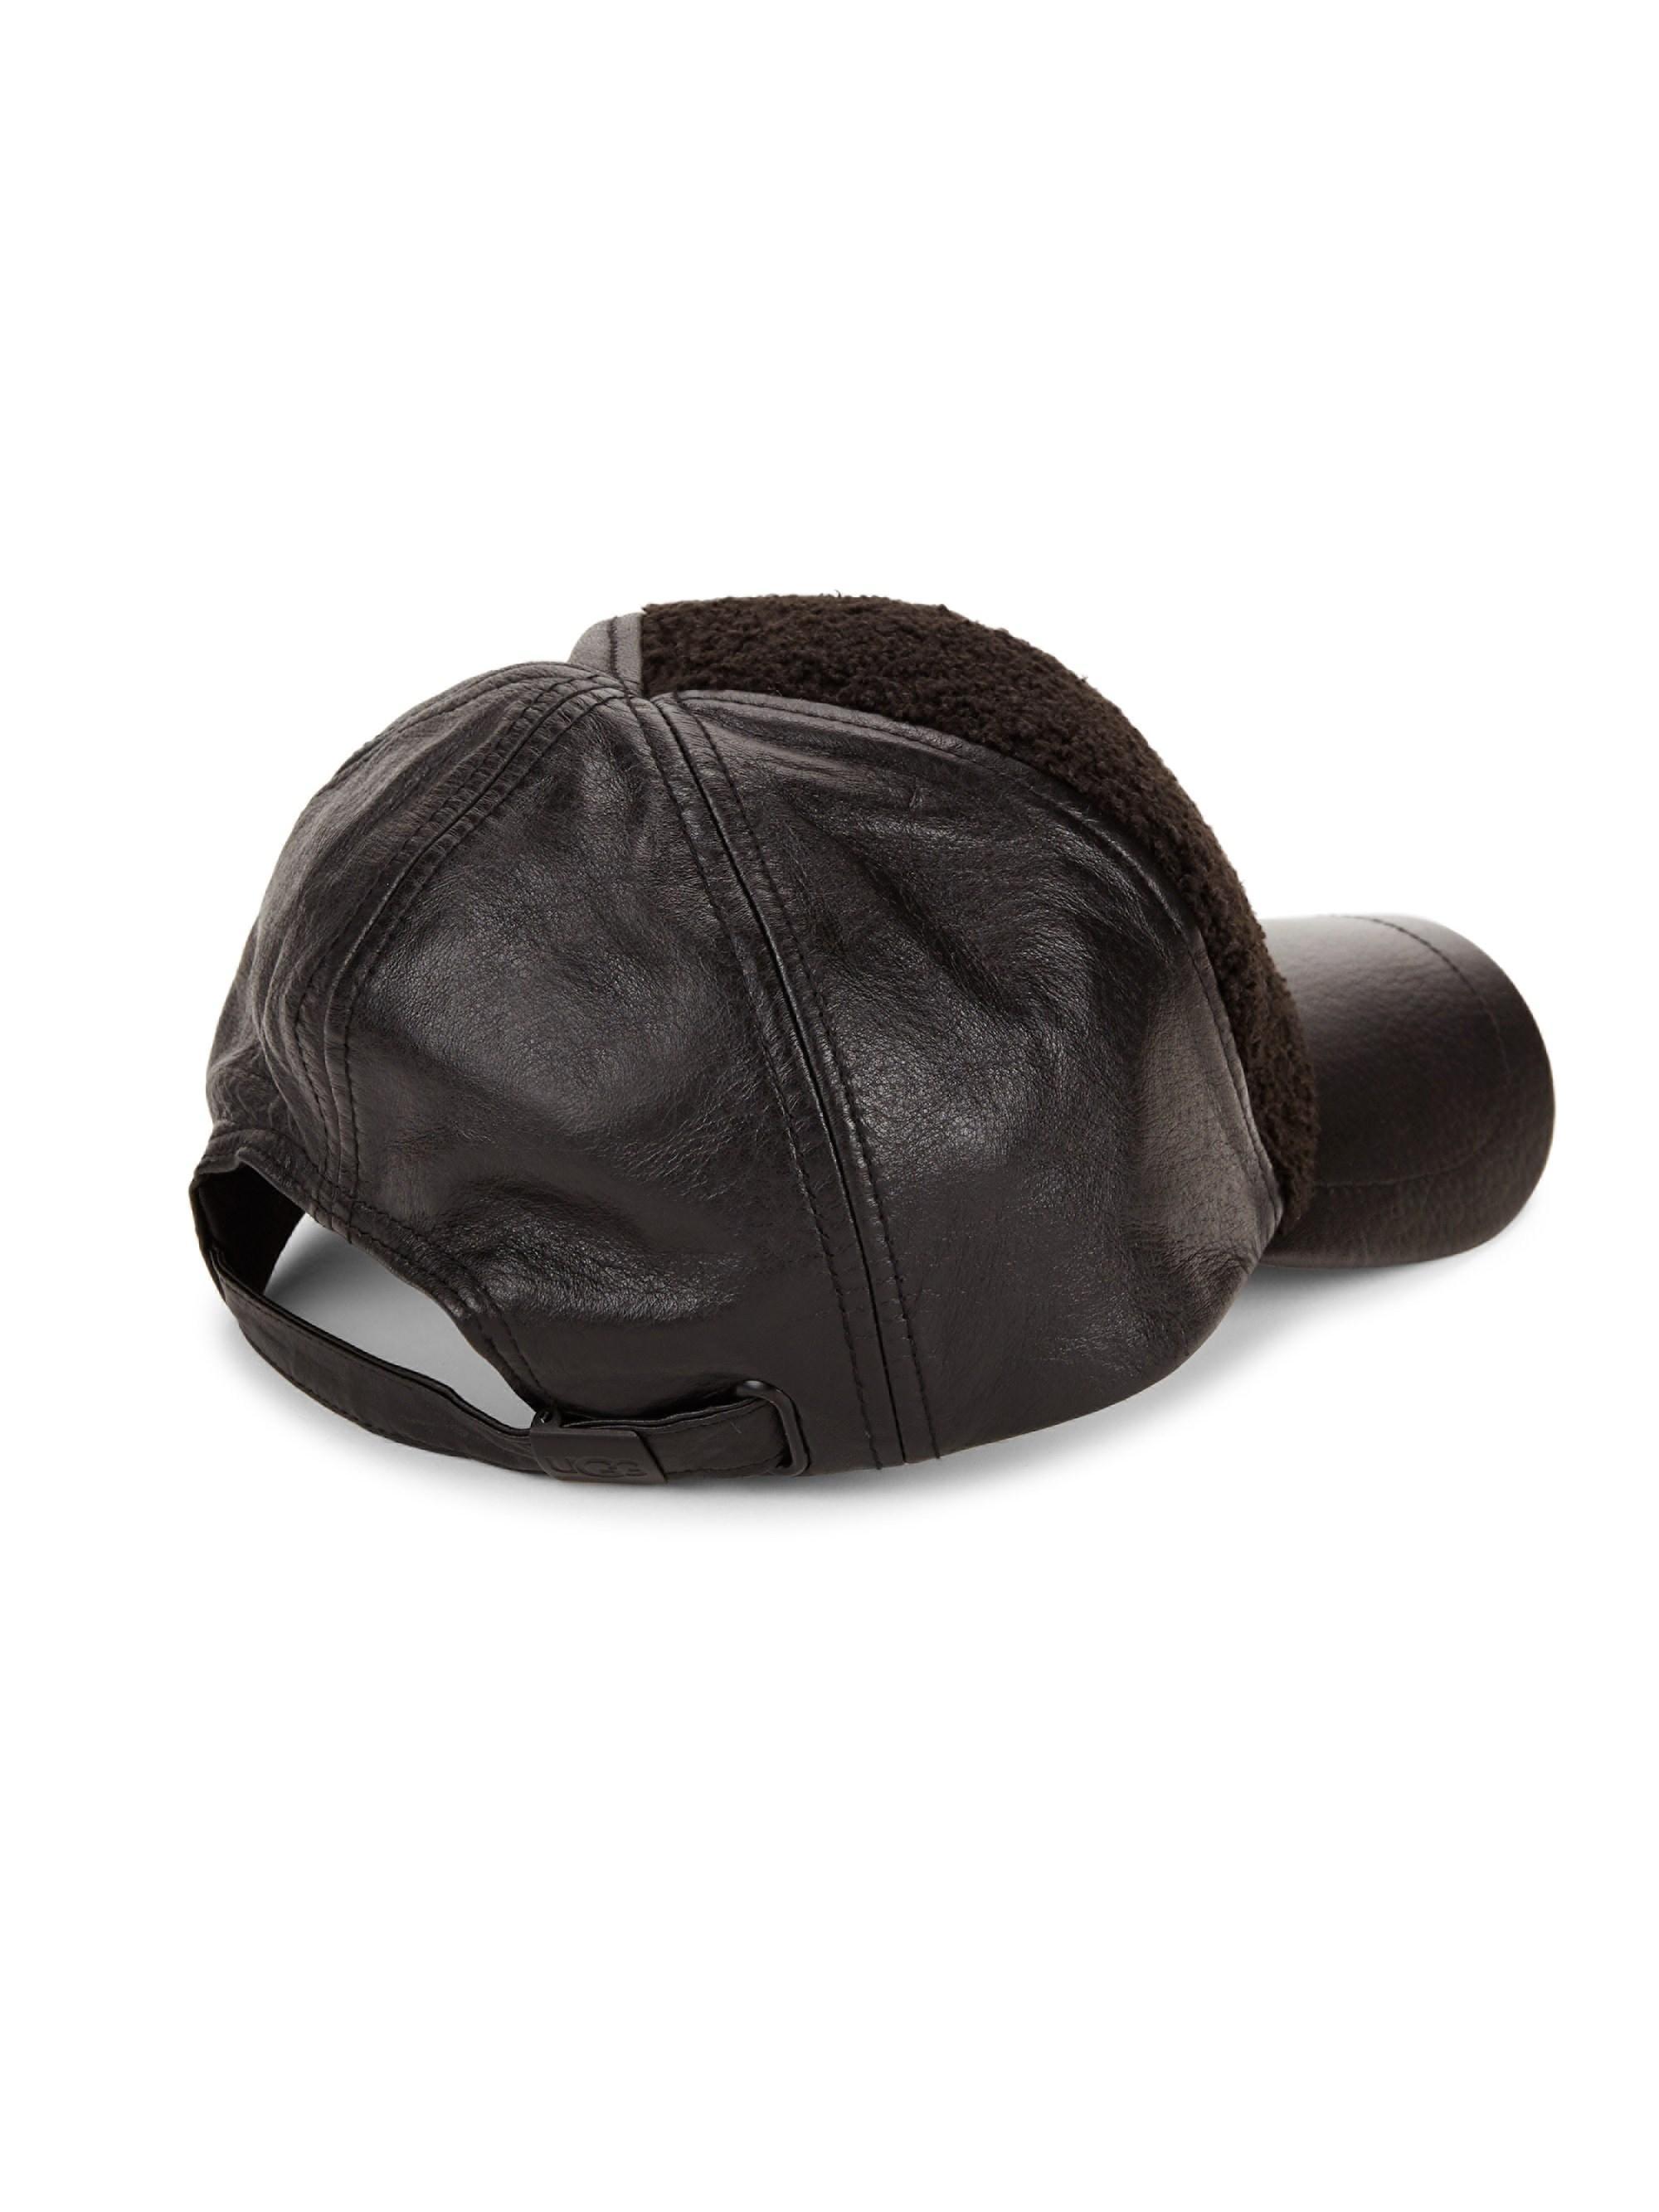 eda1da8b7 Lyst - UGG Faux Sherpa & Leather Baseball Cap in Black for Men